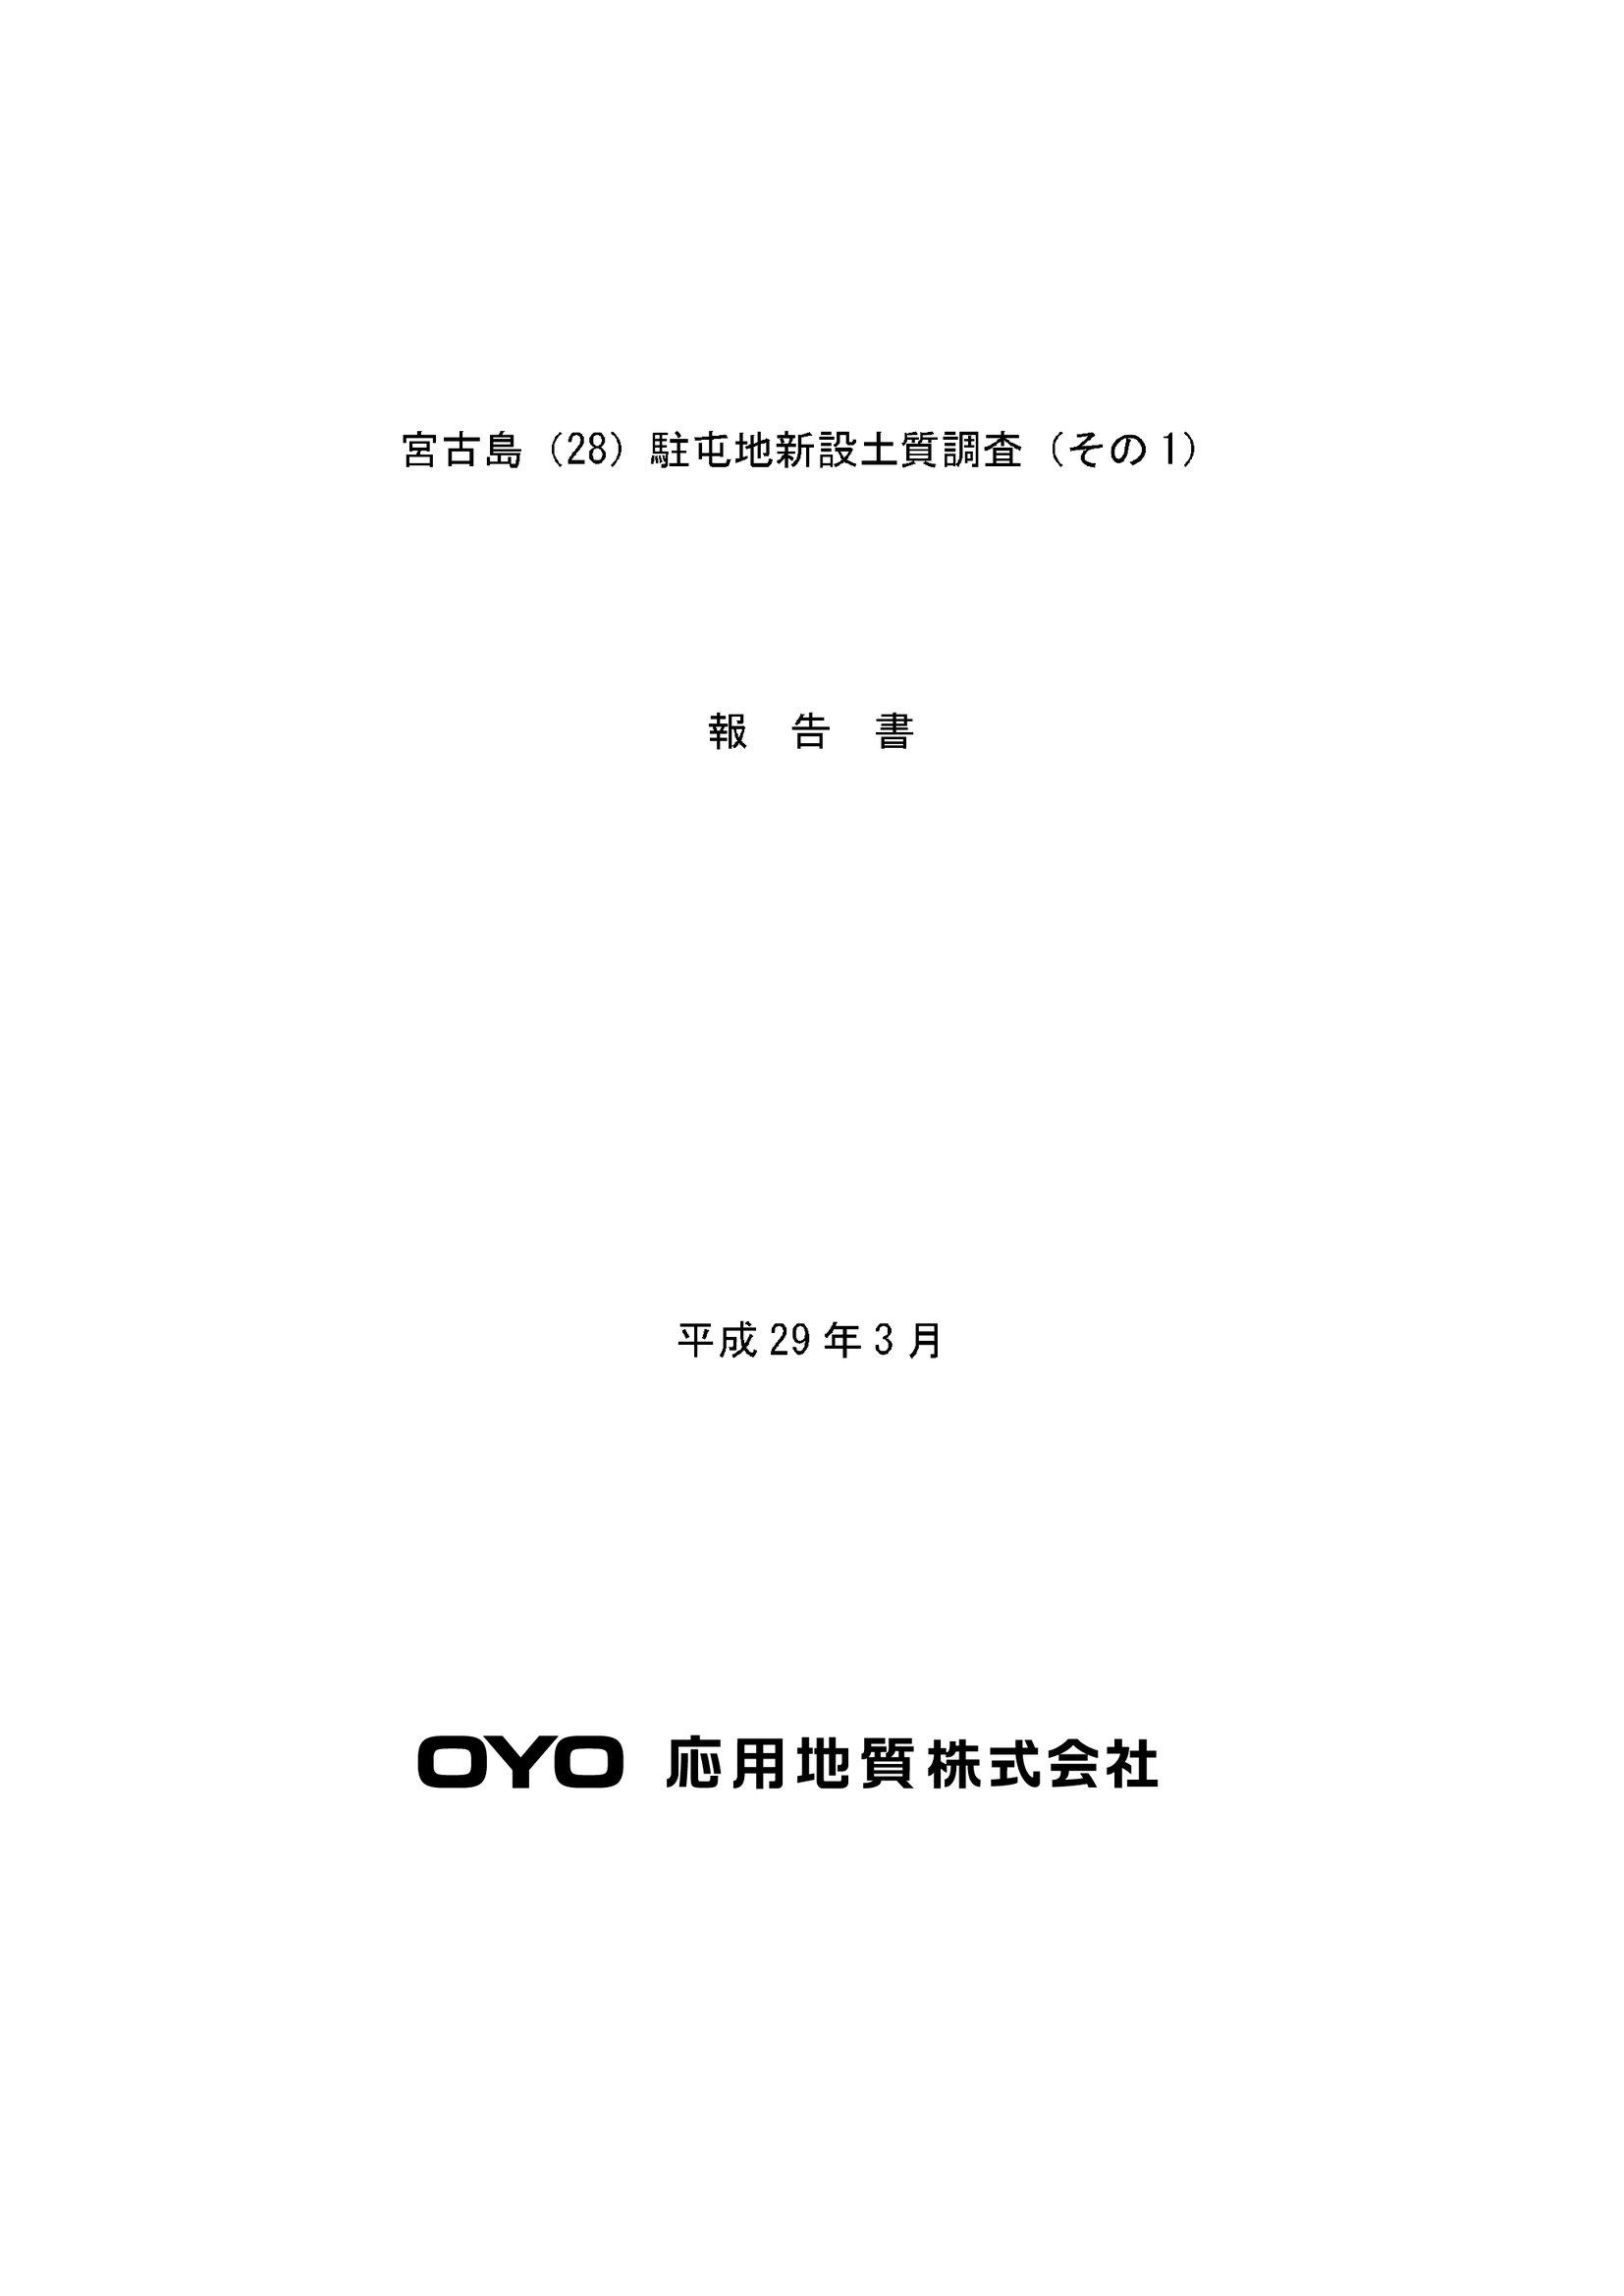 宮古島(28)駐屯地新設土質調査(その1)報告書01